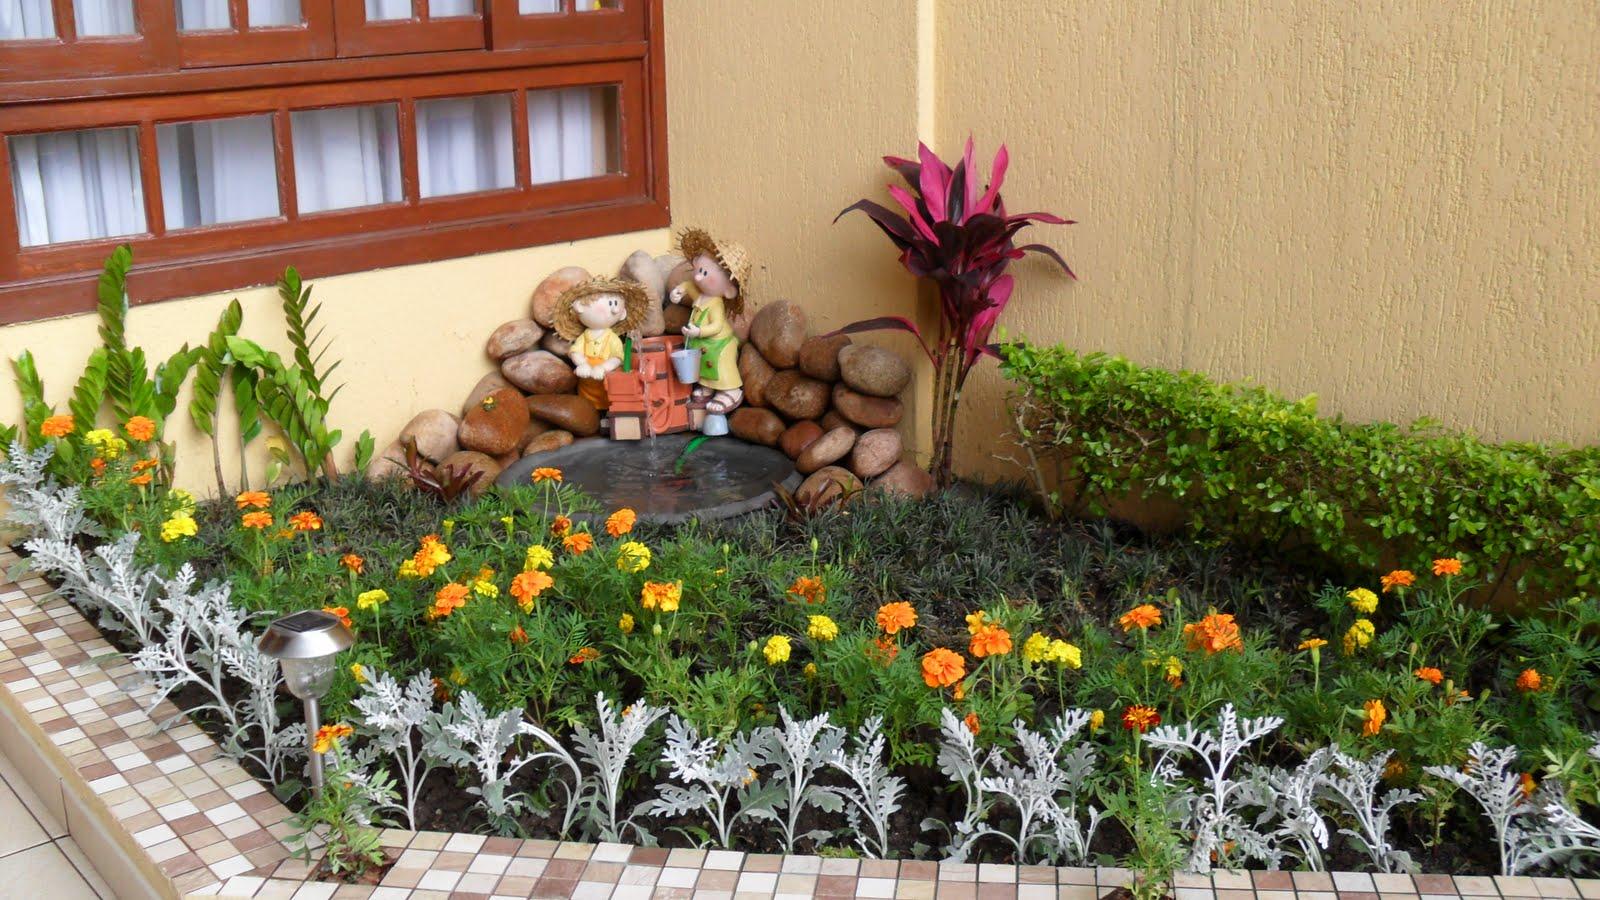 cerca de jardim barata : cerca de jardim barata:Antes de ir á floricultura para adquirir as plantas e flores